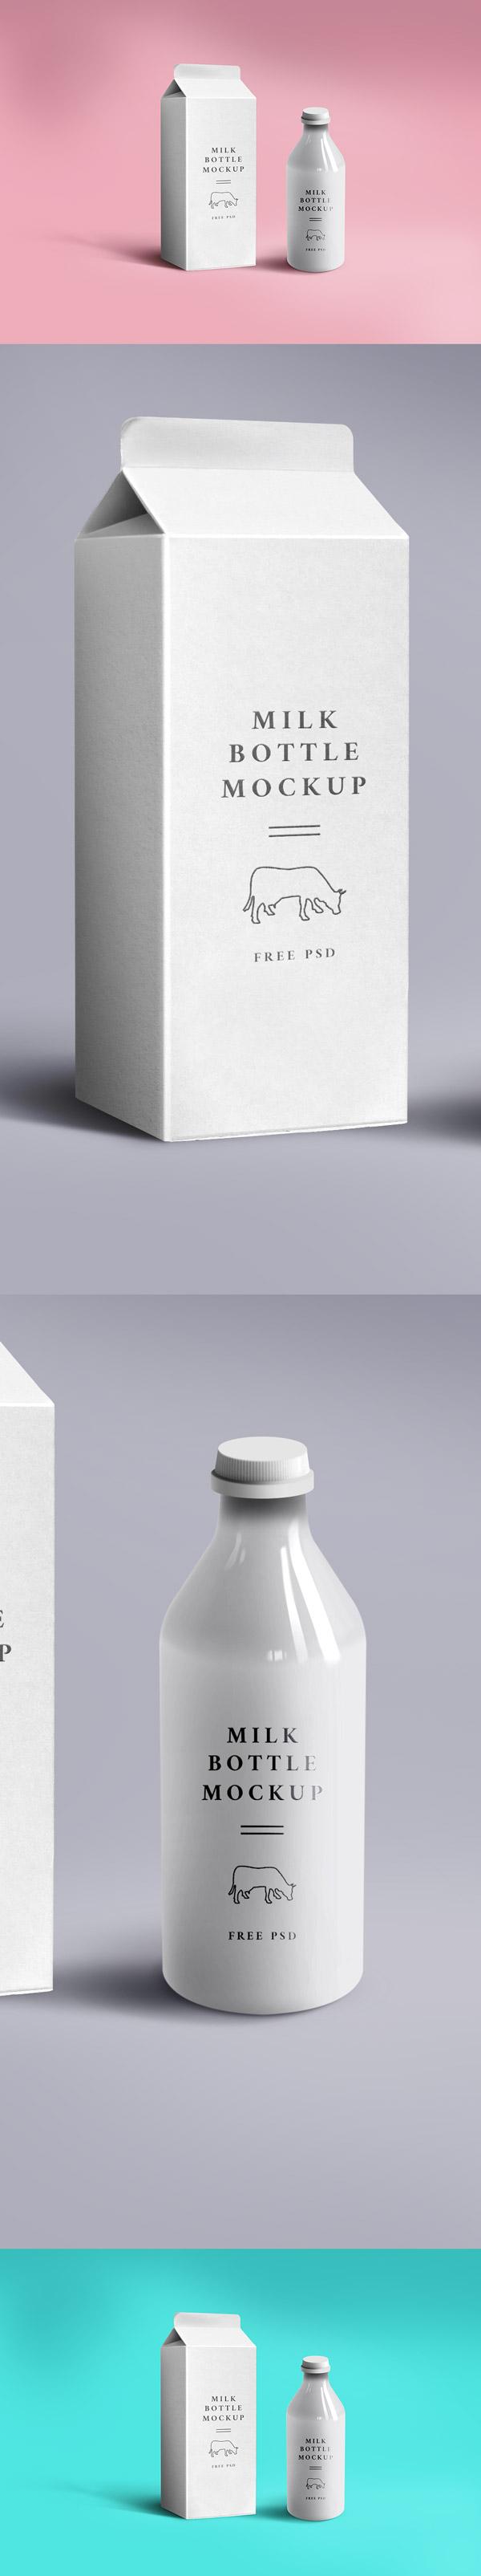 milk-packaging-mockup-psd